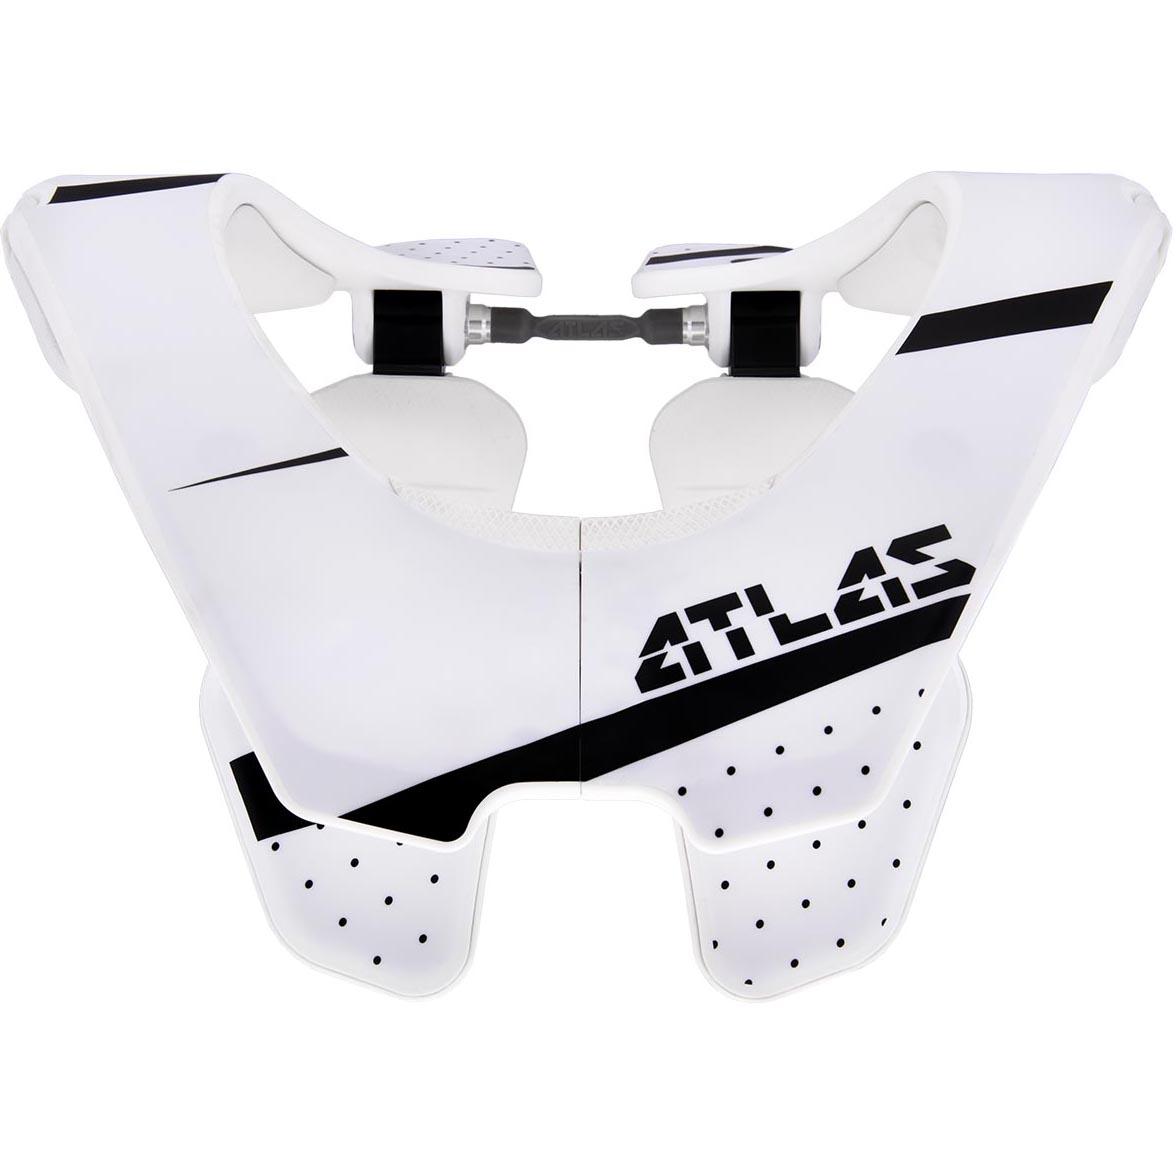 Atlas - 2017 Air Trooper защита шеи, бело-черная